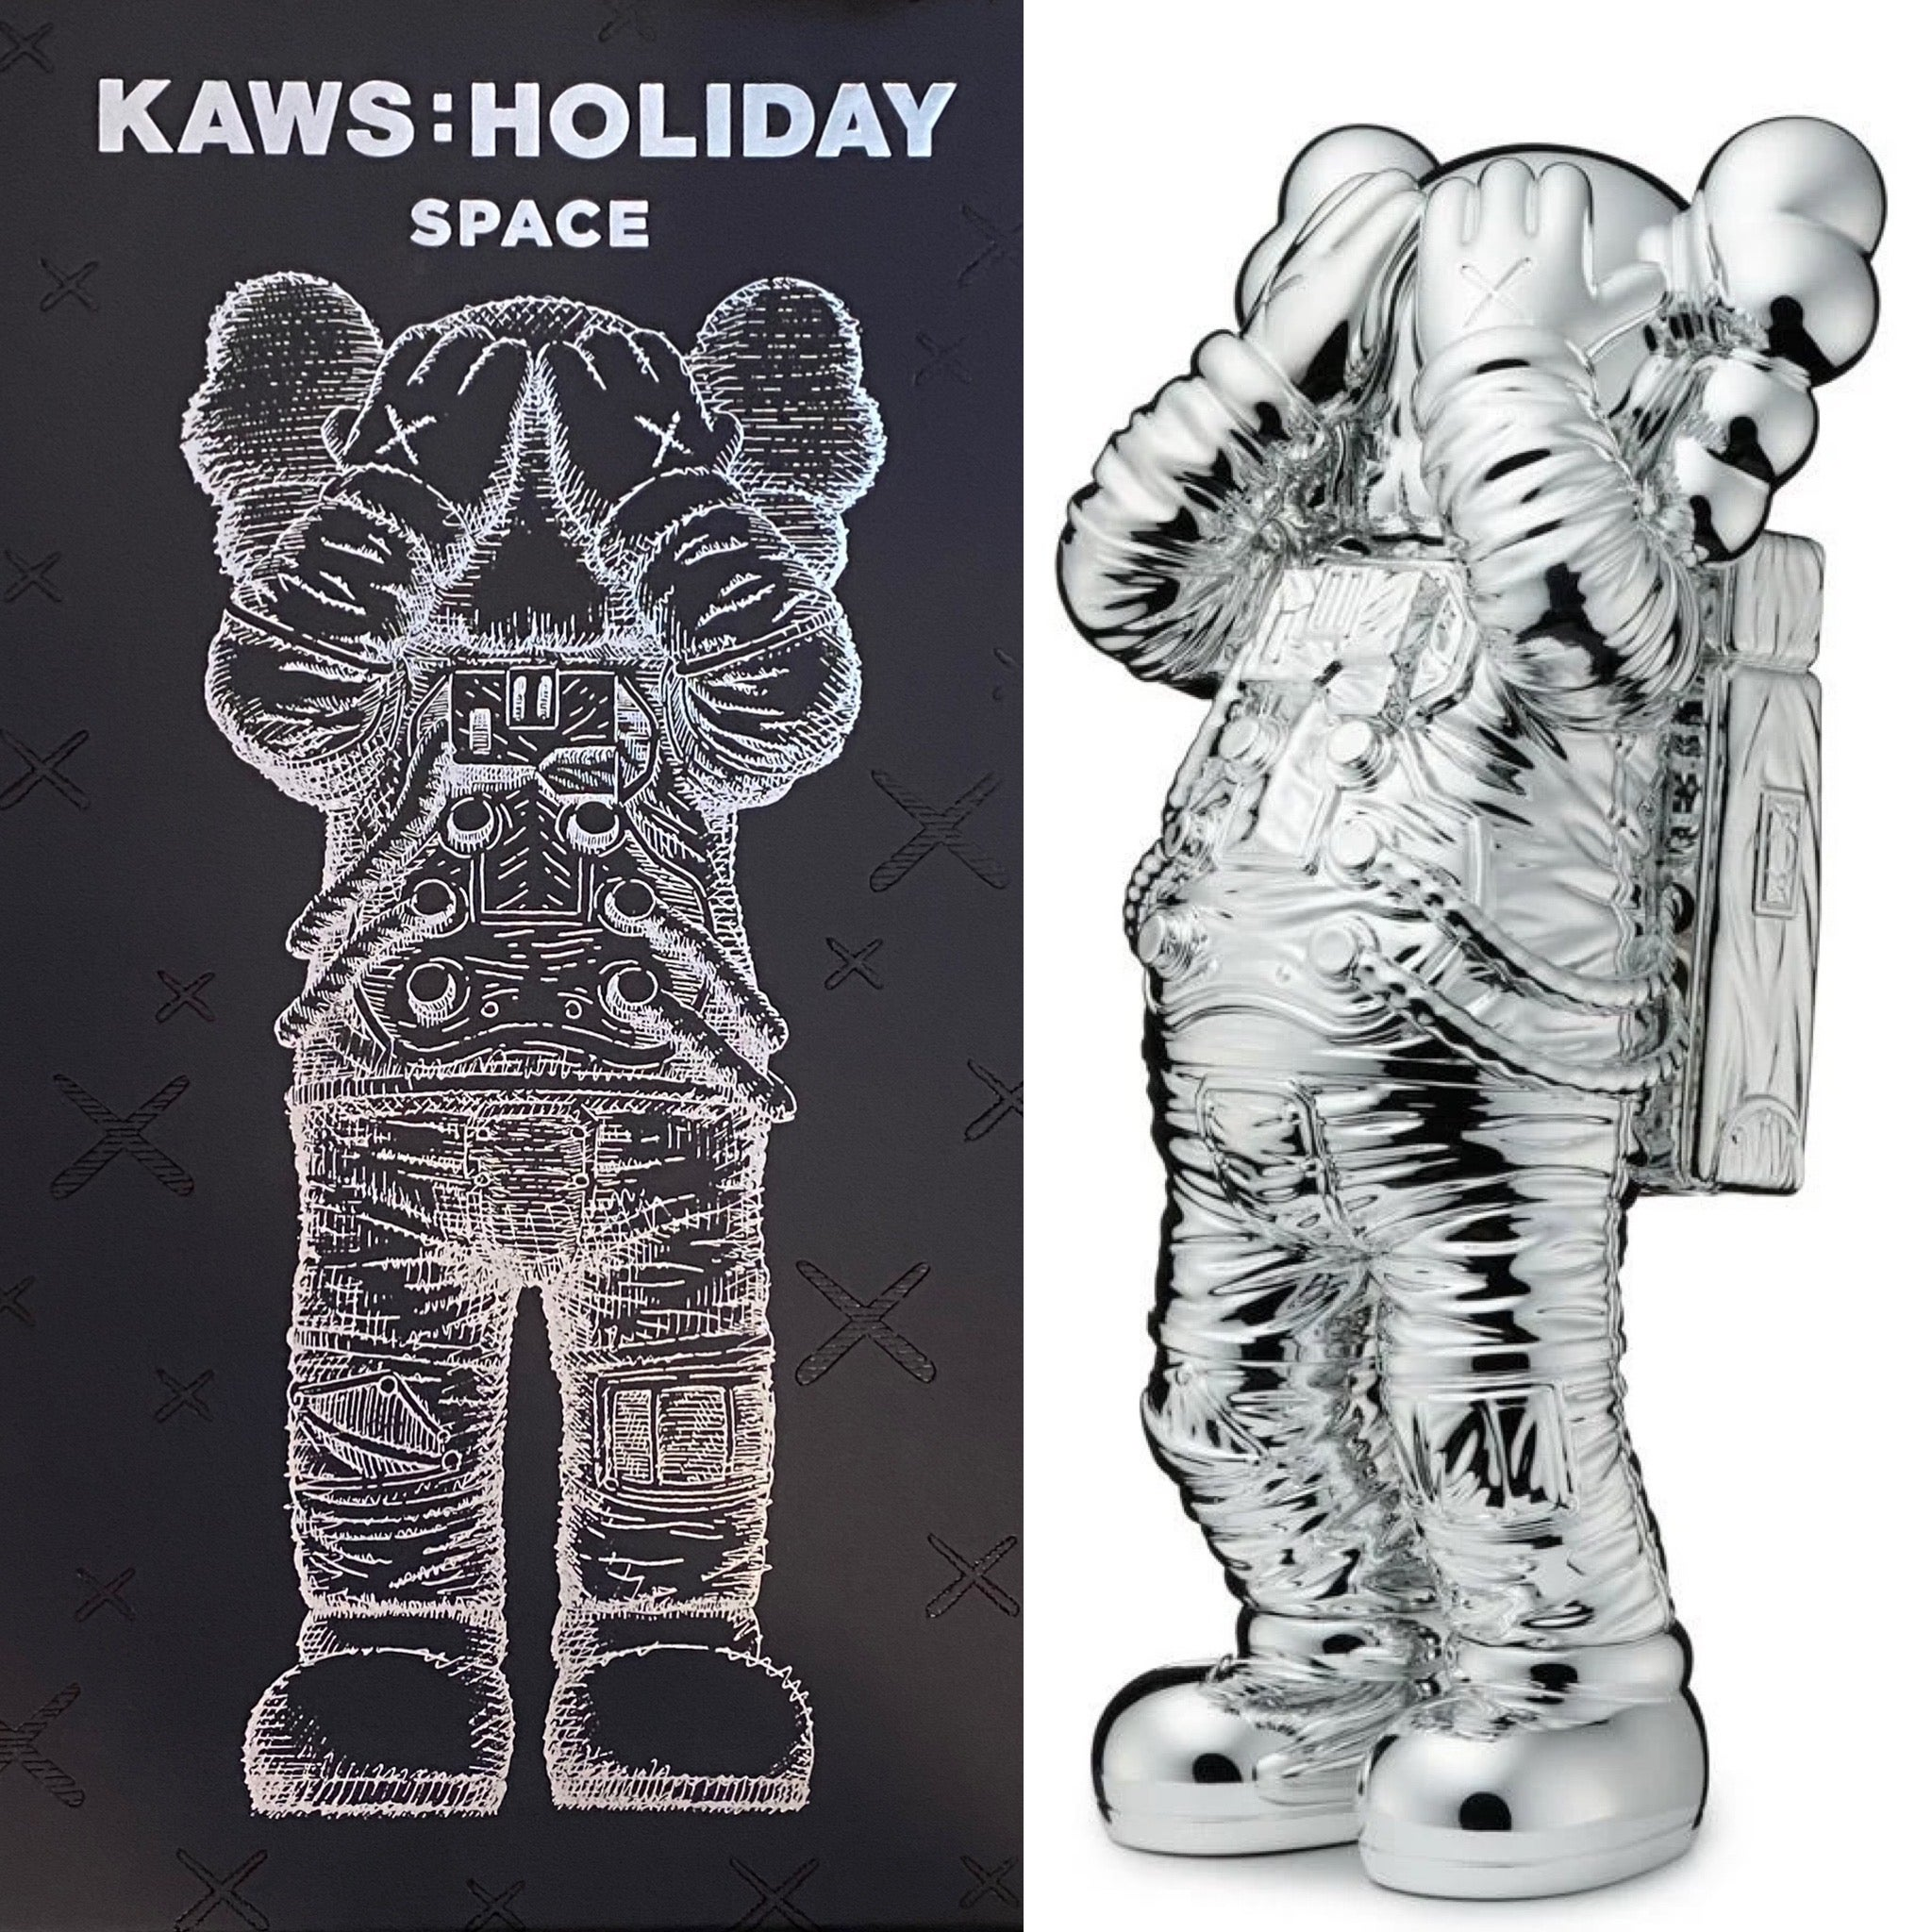 KAWS Holiday SPACE Companion (KAWS silver holiday space)